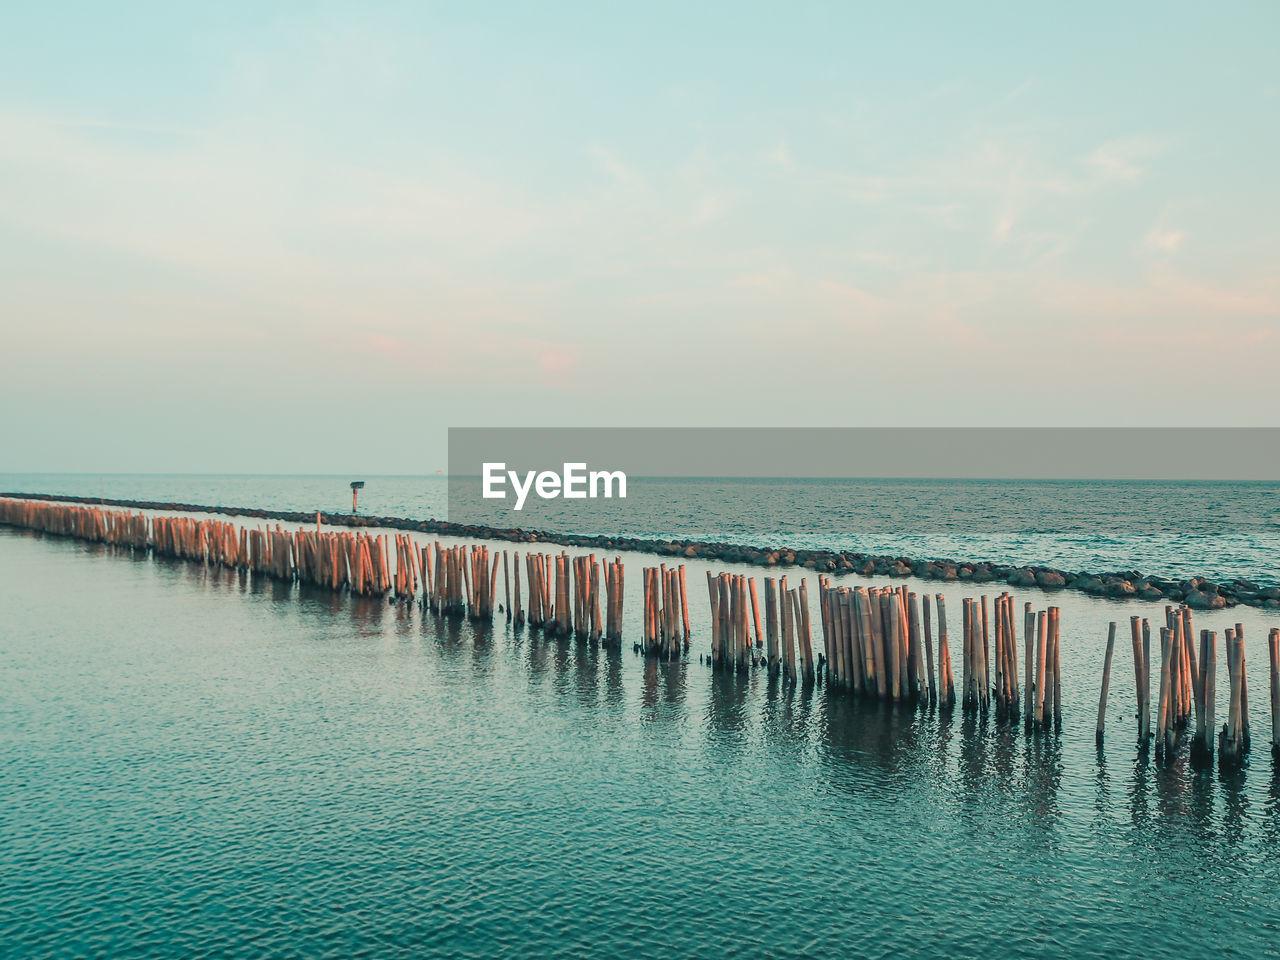 water, sea, horizon over water, sky, horizon, scenics - nature, beauty in nature, tranquility, tranquil scene, waterfront, nature, cloud - sky, no people, sunset, idyllic, beach, non-urban scene, land, outdoors, wooden post, groyne